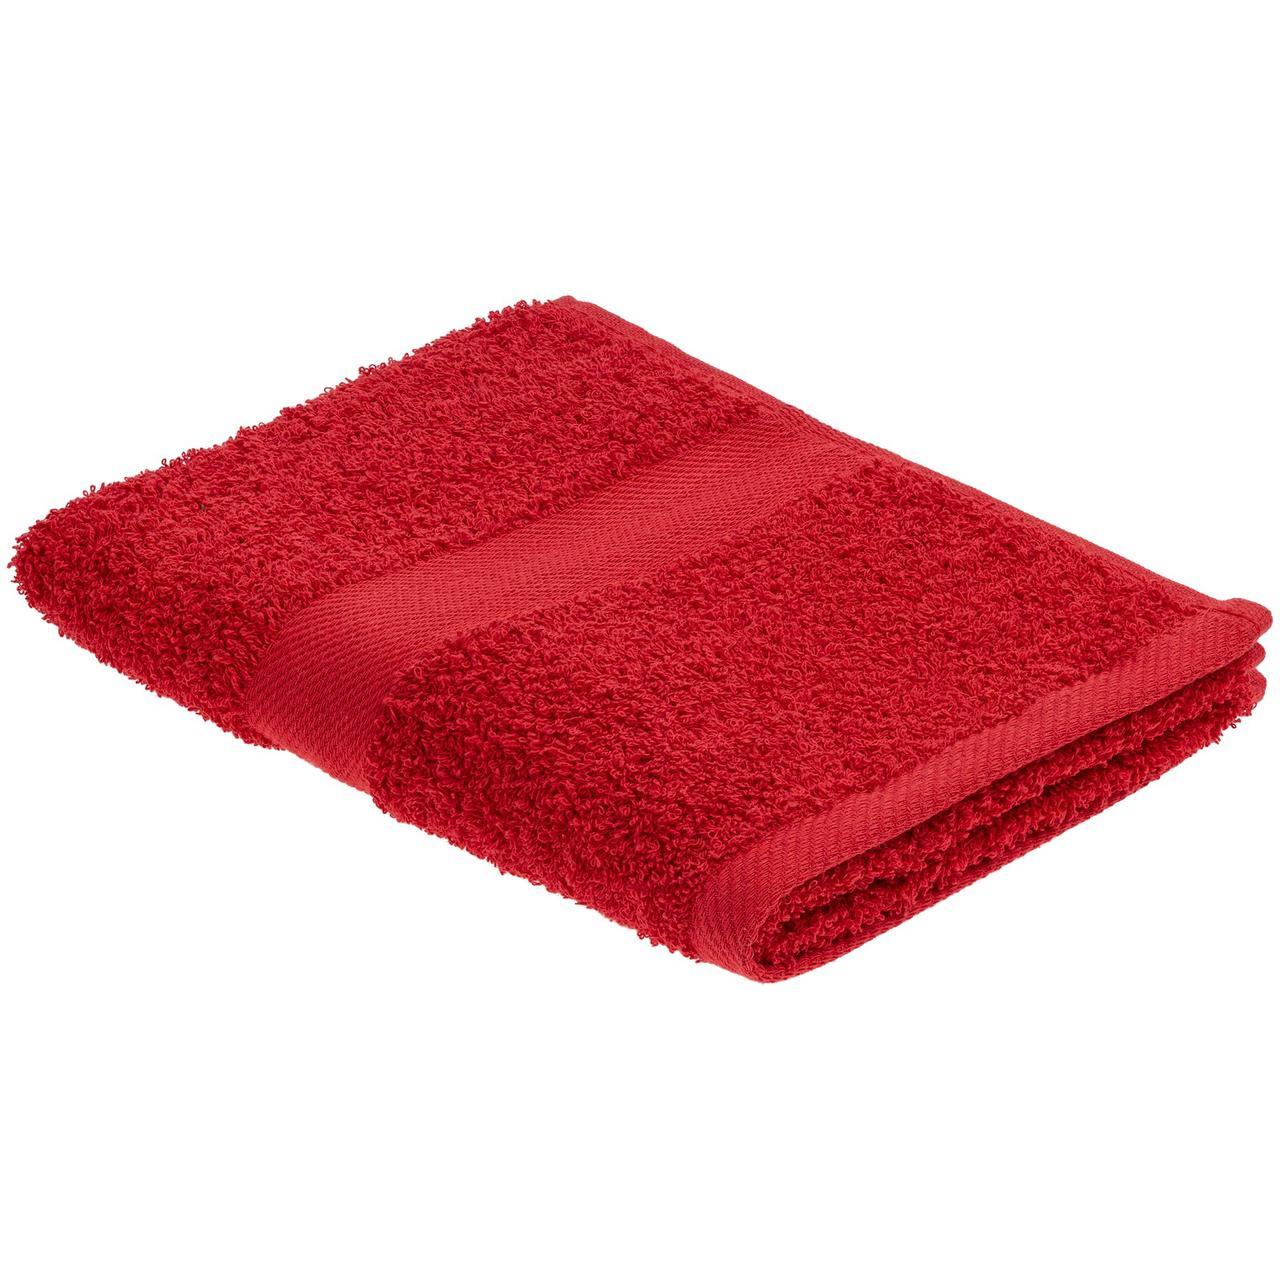 Полотенце Embrace, среднее, красное (артикул 20099.50)